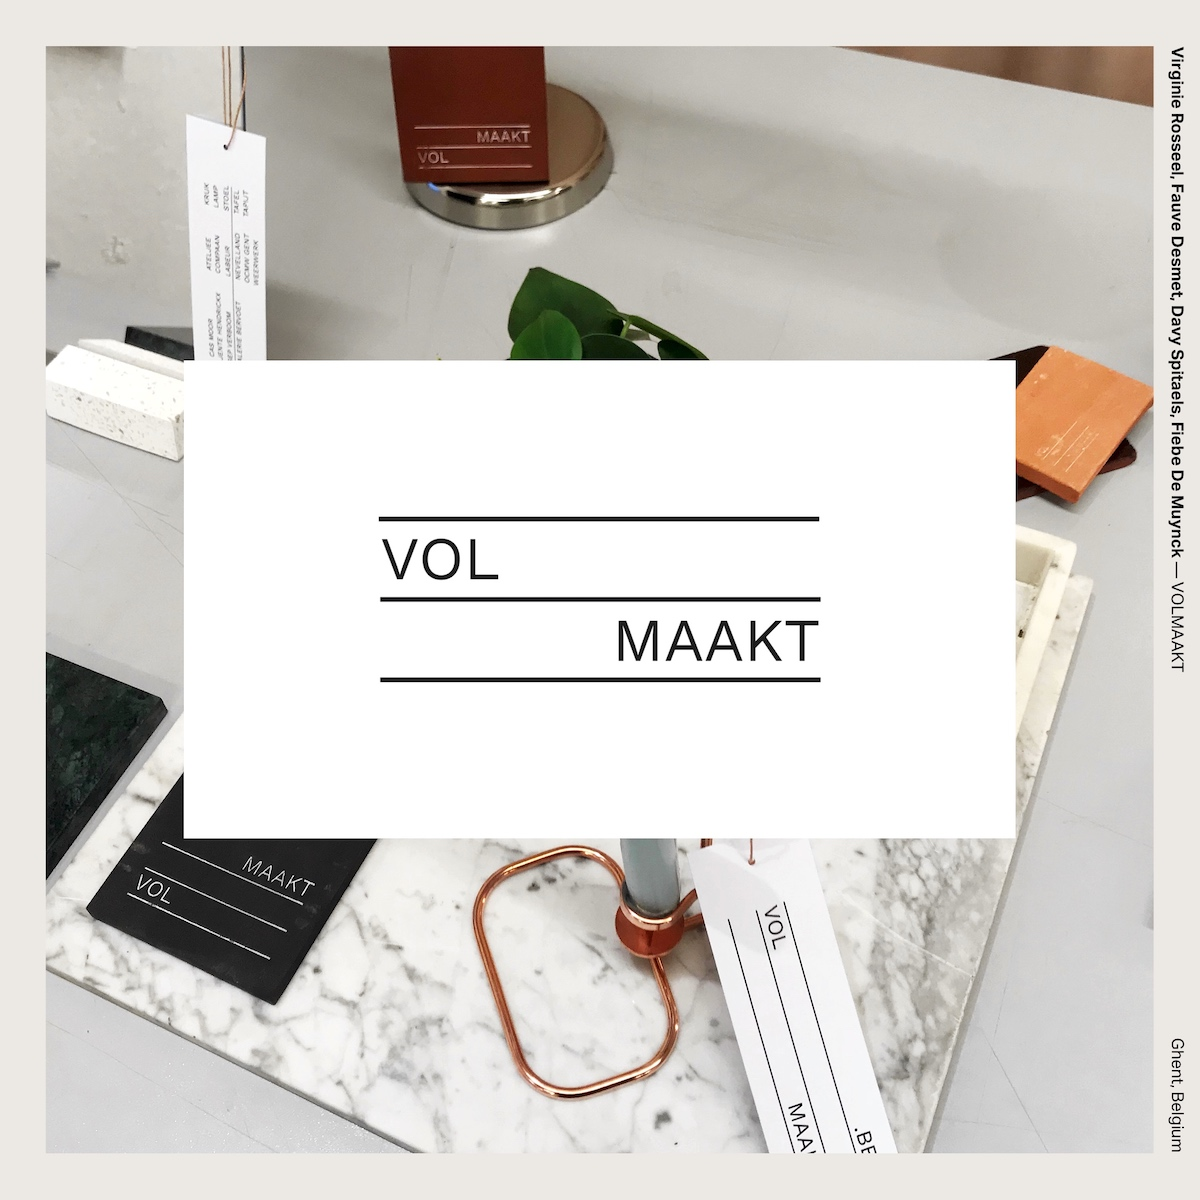 Virginie Rosseel, Fauve Desmet, Davy Spitaels, Fiebe De Muynck — VOLMAAKT